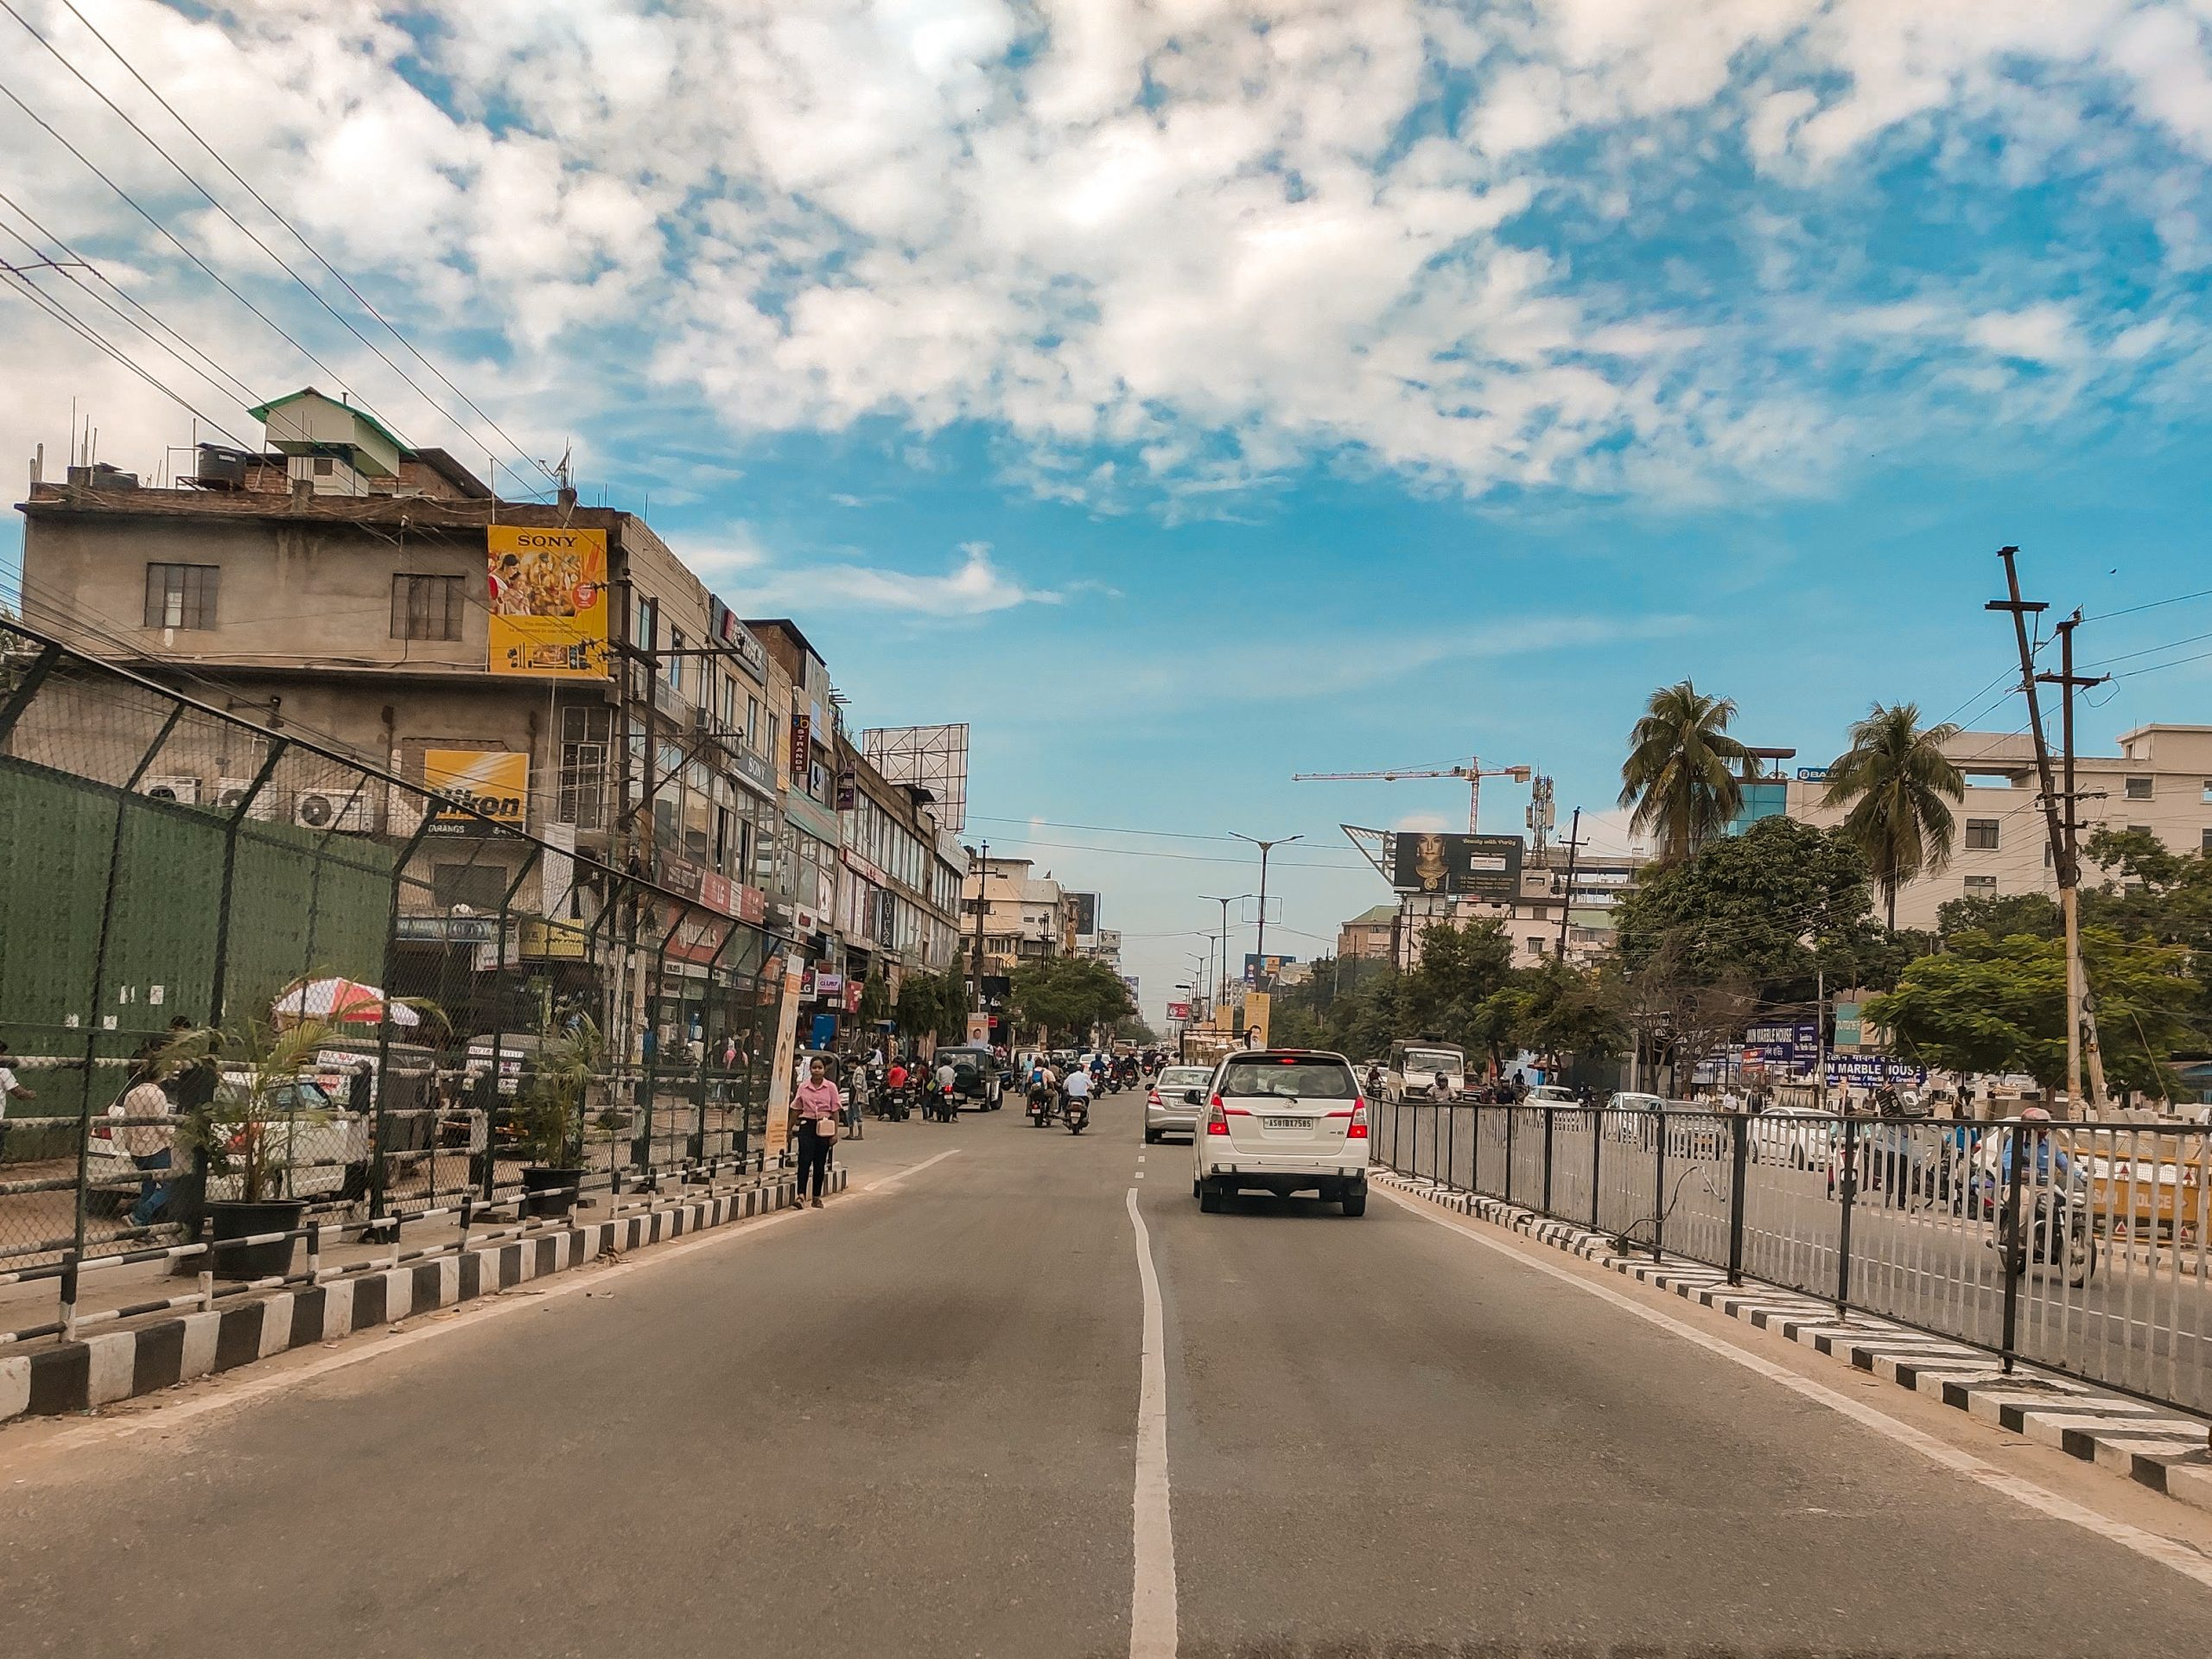 Guwahati street view